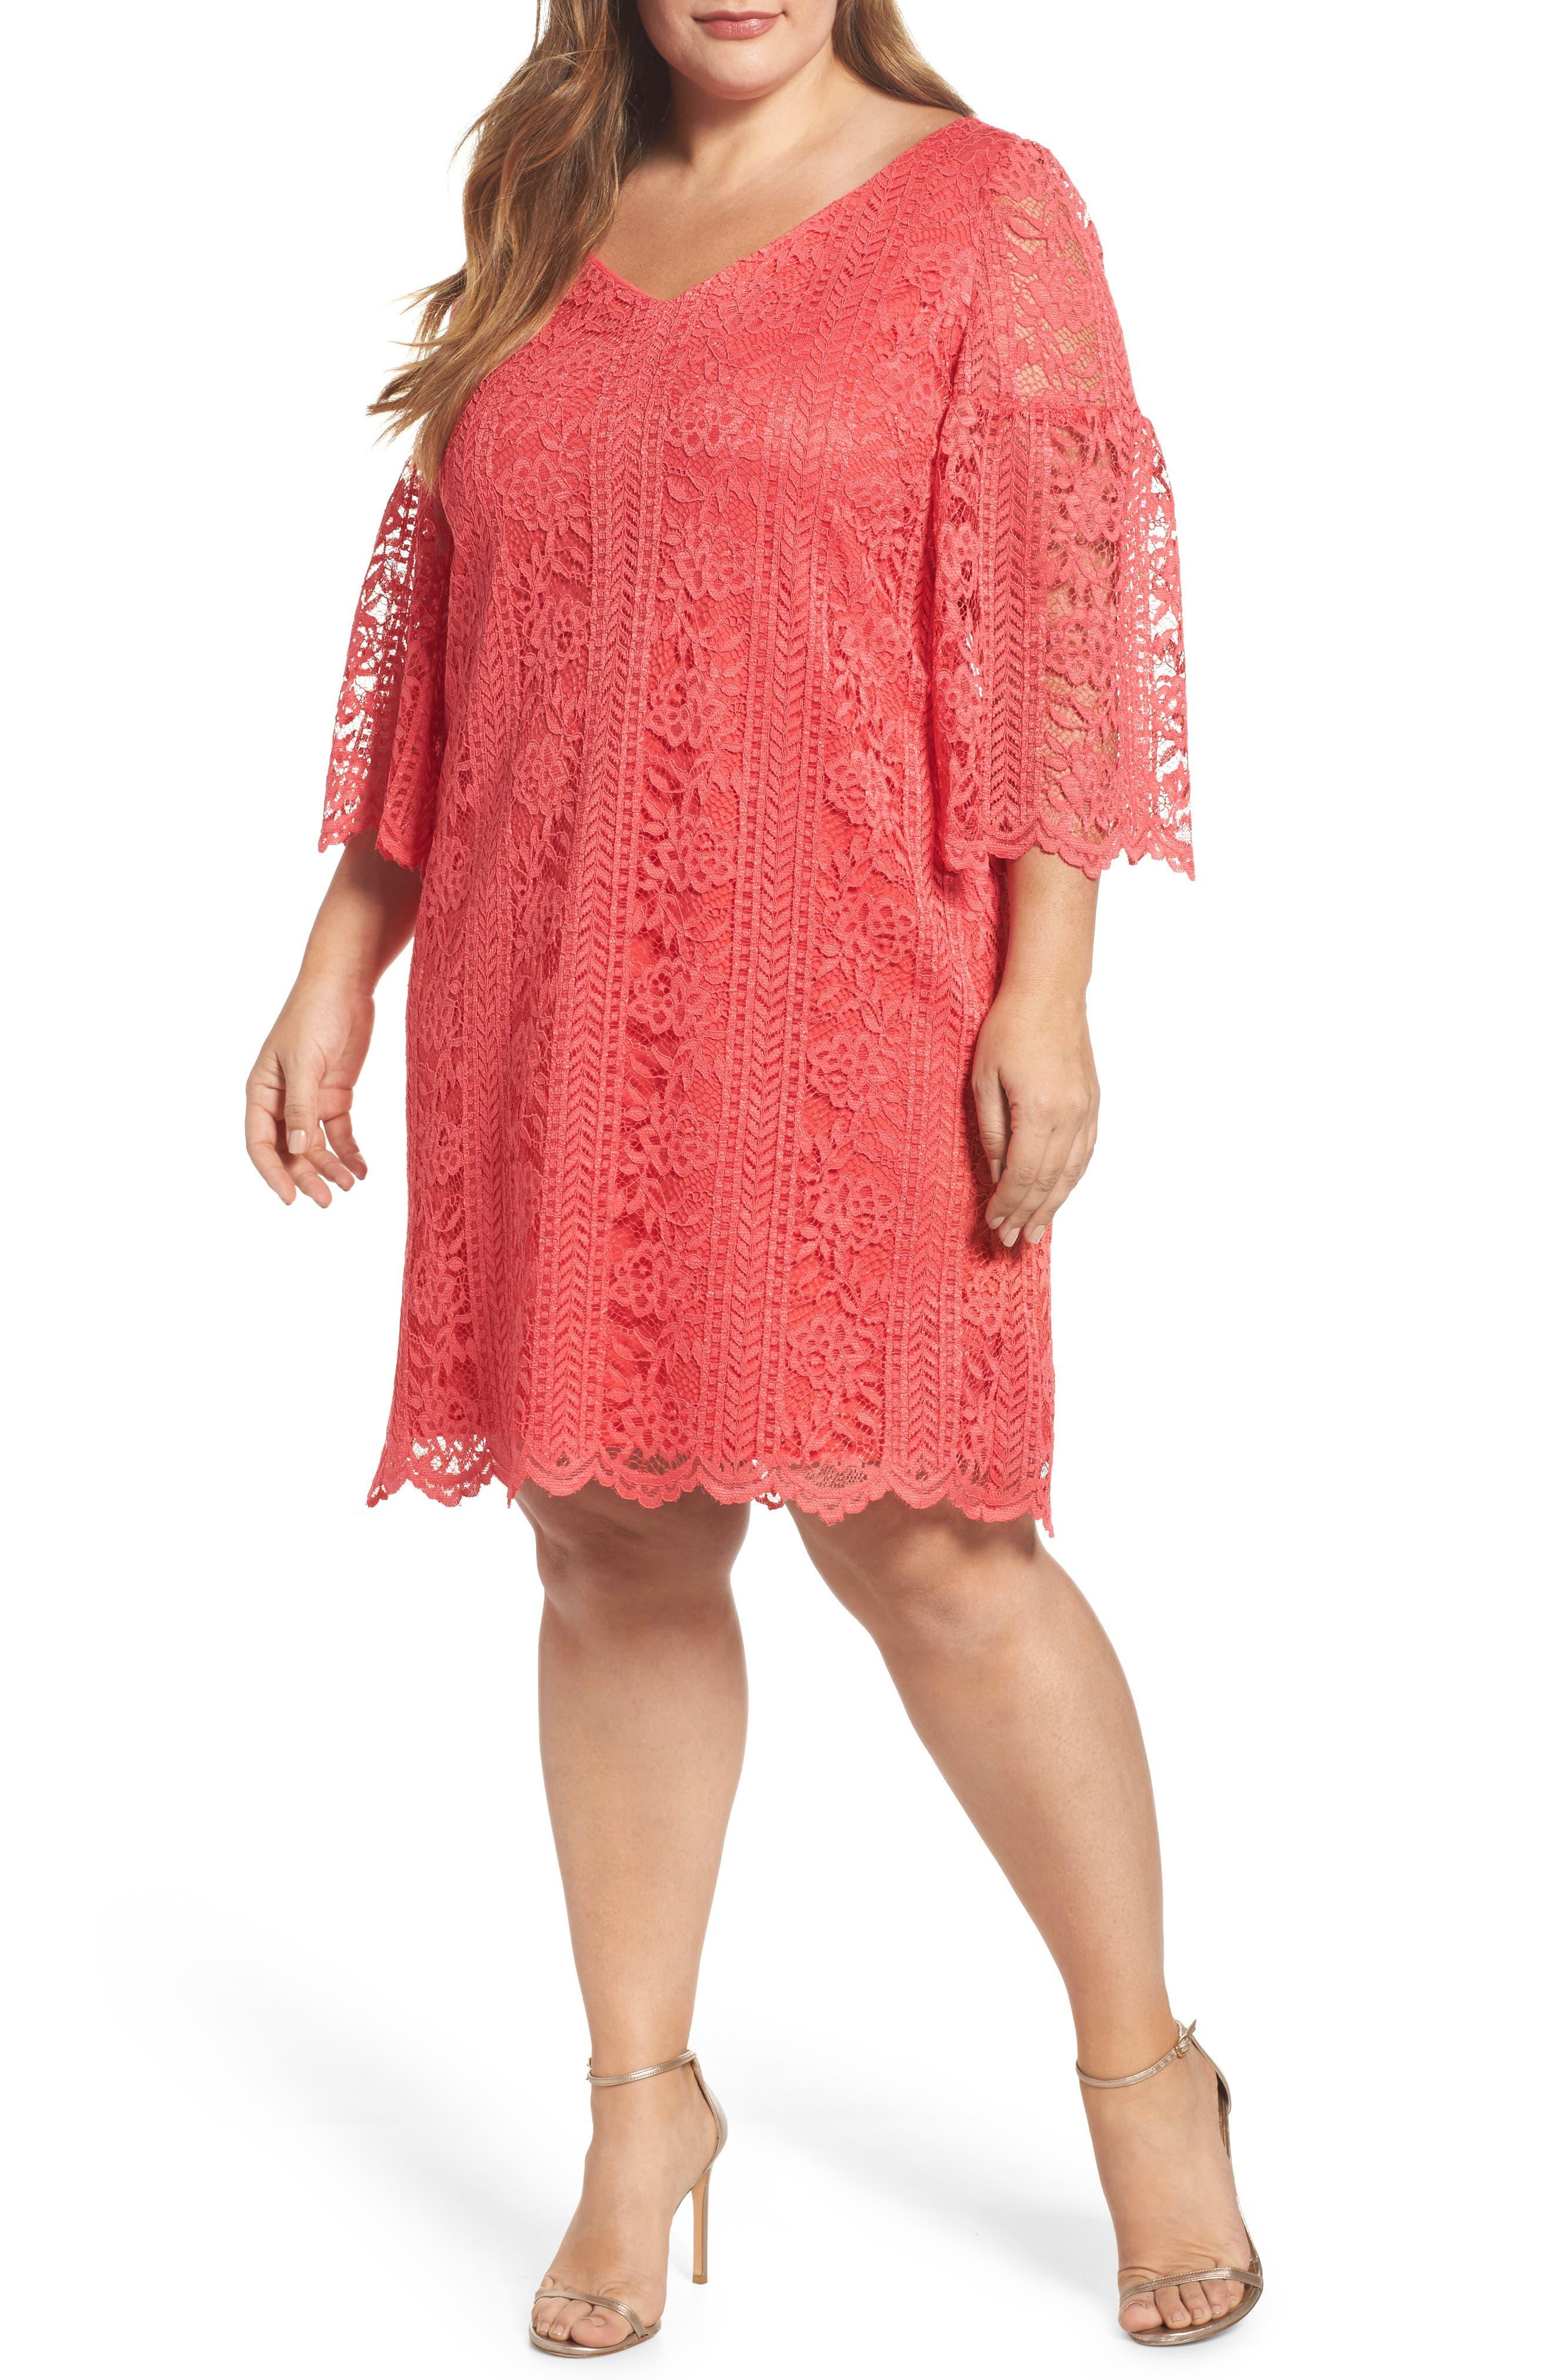 Gabby Skye Bell Sleeve Lace Shift Dress (Plus Size)